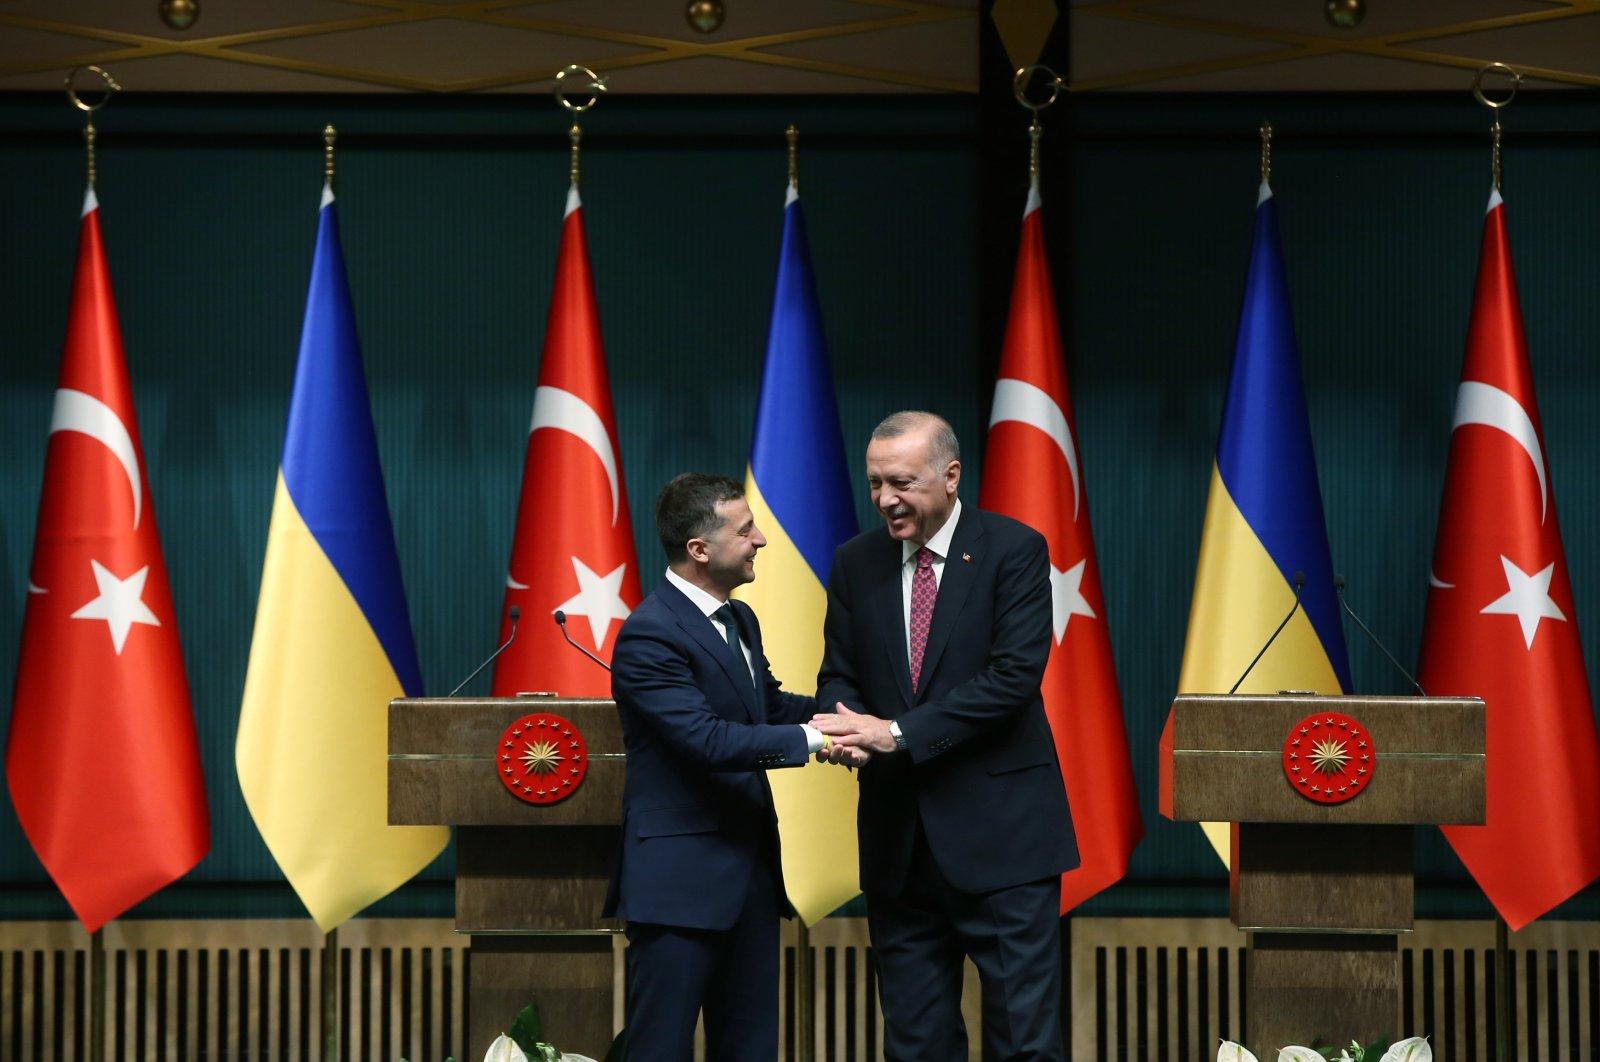 President Recep Tayyip Erdoğan meets with his Ukrainian counterpart, Volodymyr Zelenskiy, in Istanbul, Turkey, Aug. 8, 2019. (AA Photo)